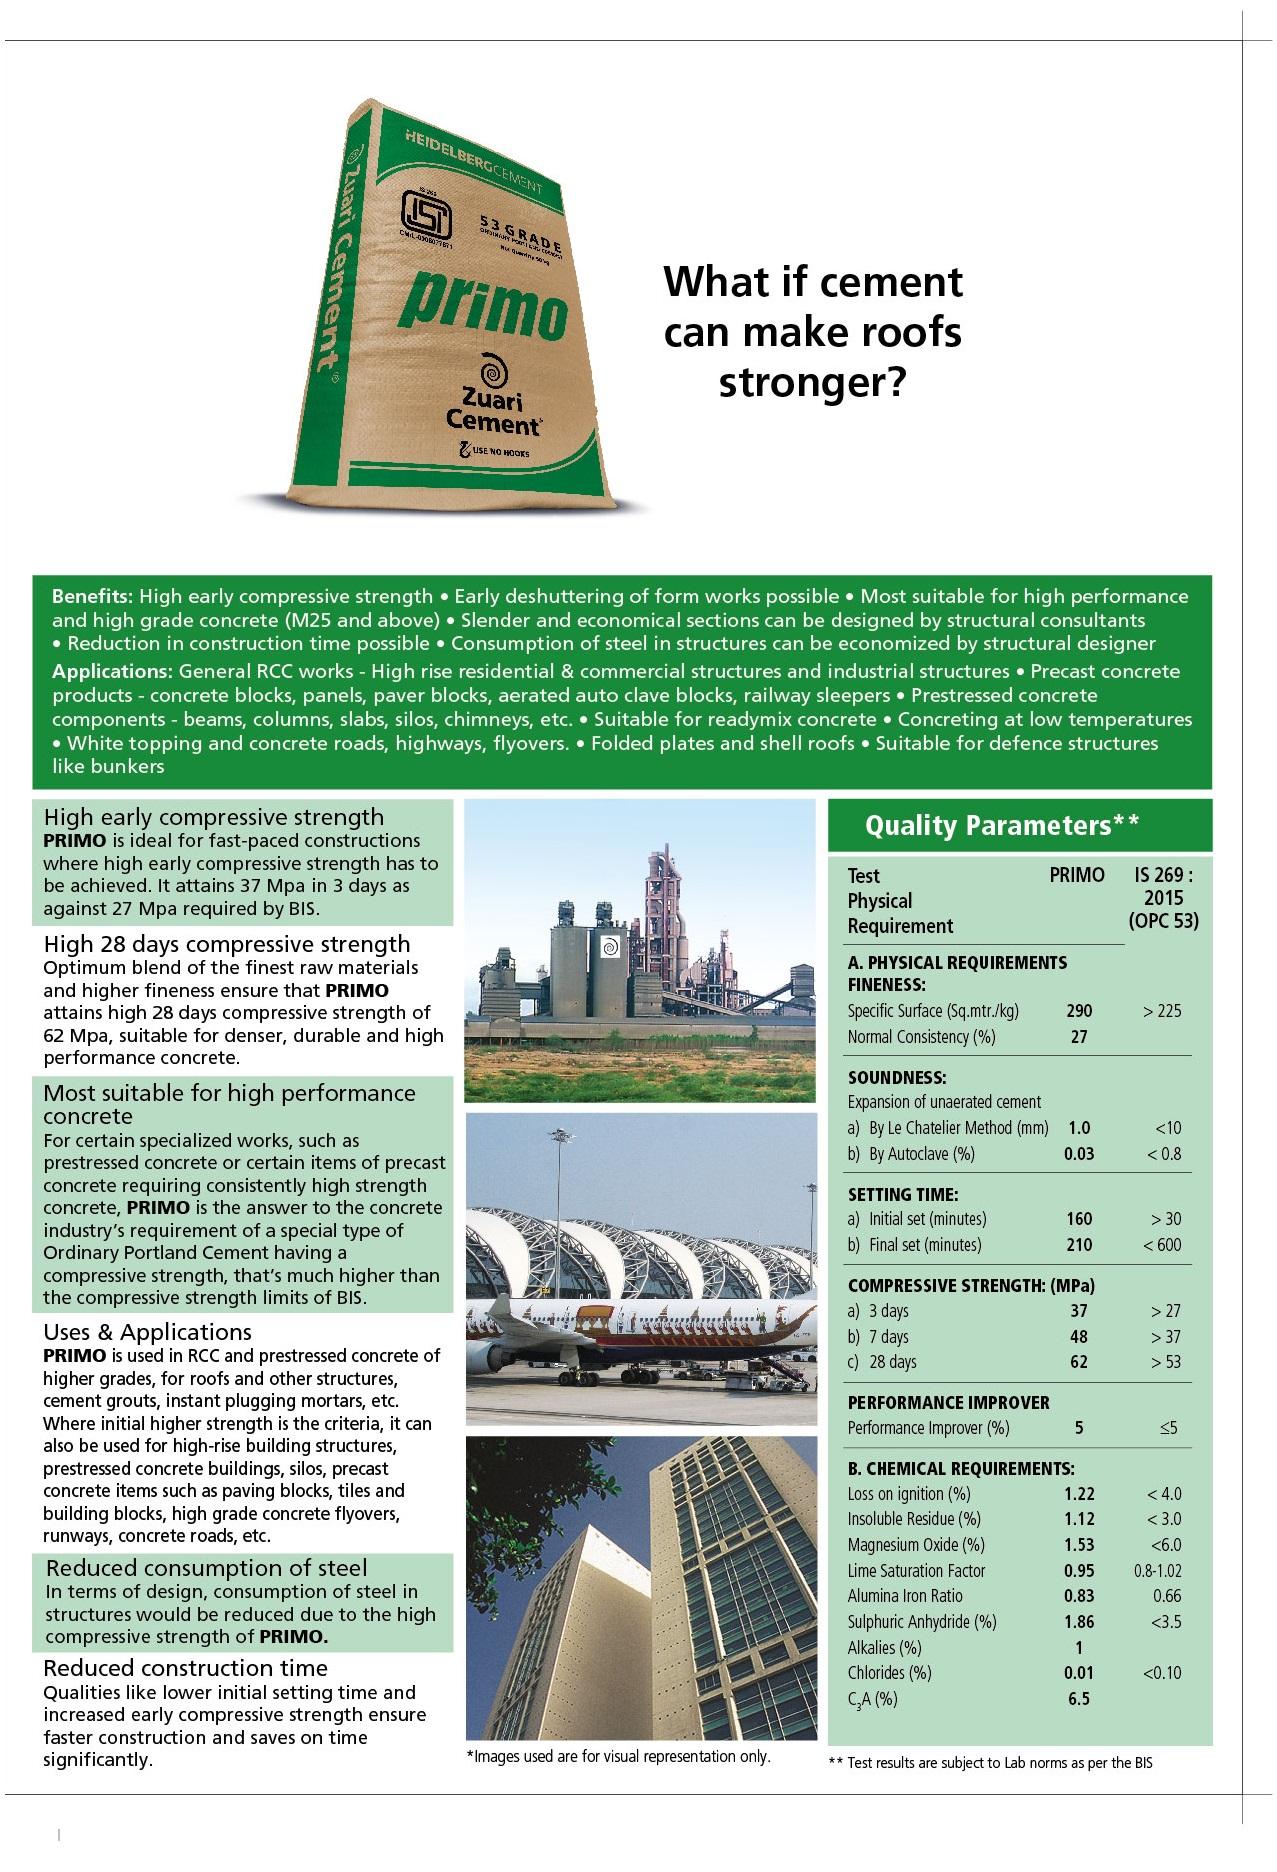 Sagar cement price in bangalore dating